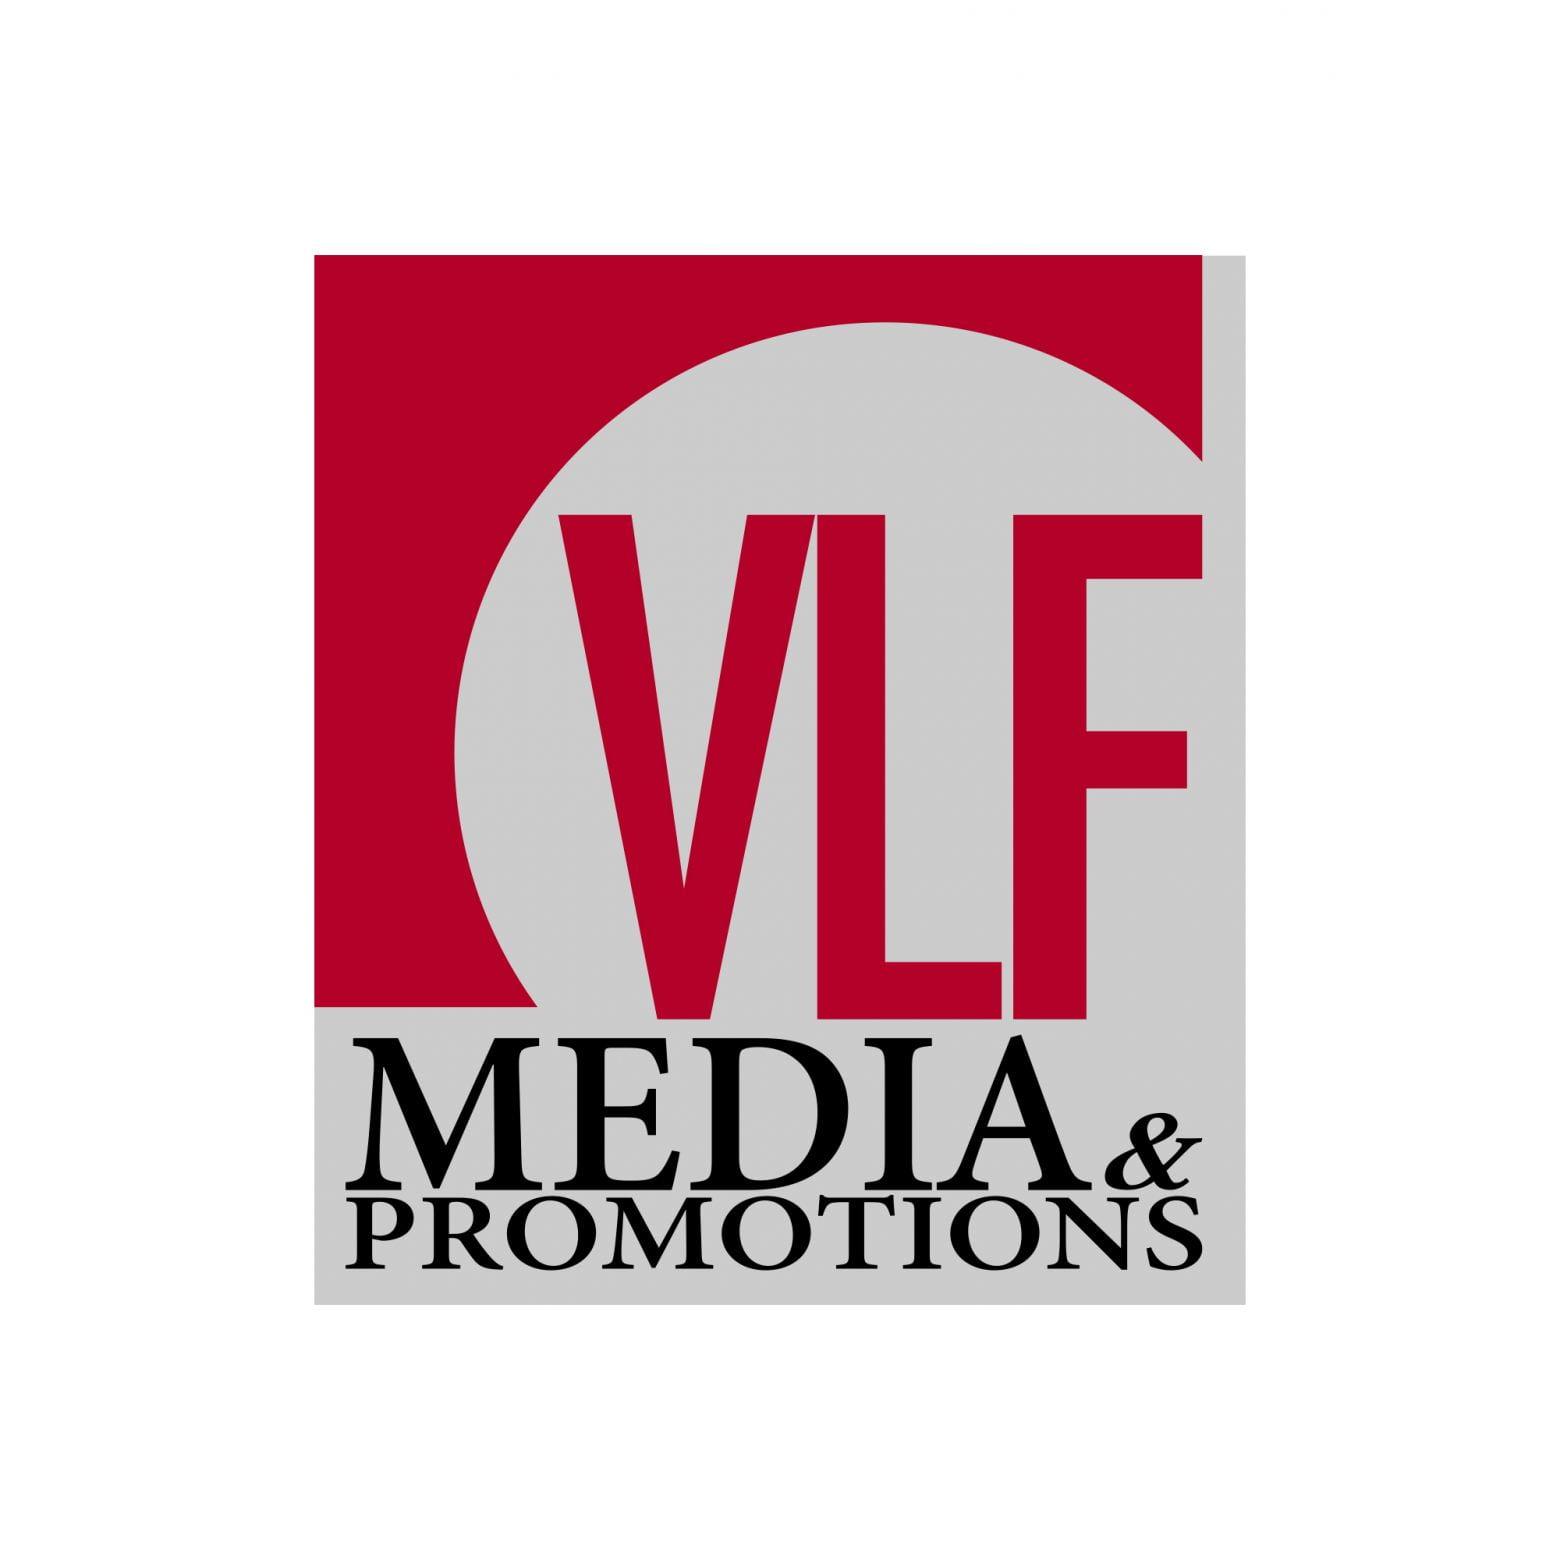 VLF Media & Promotions